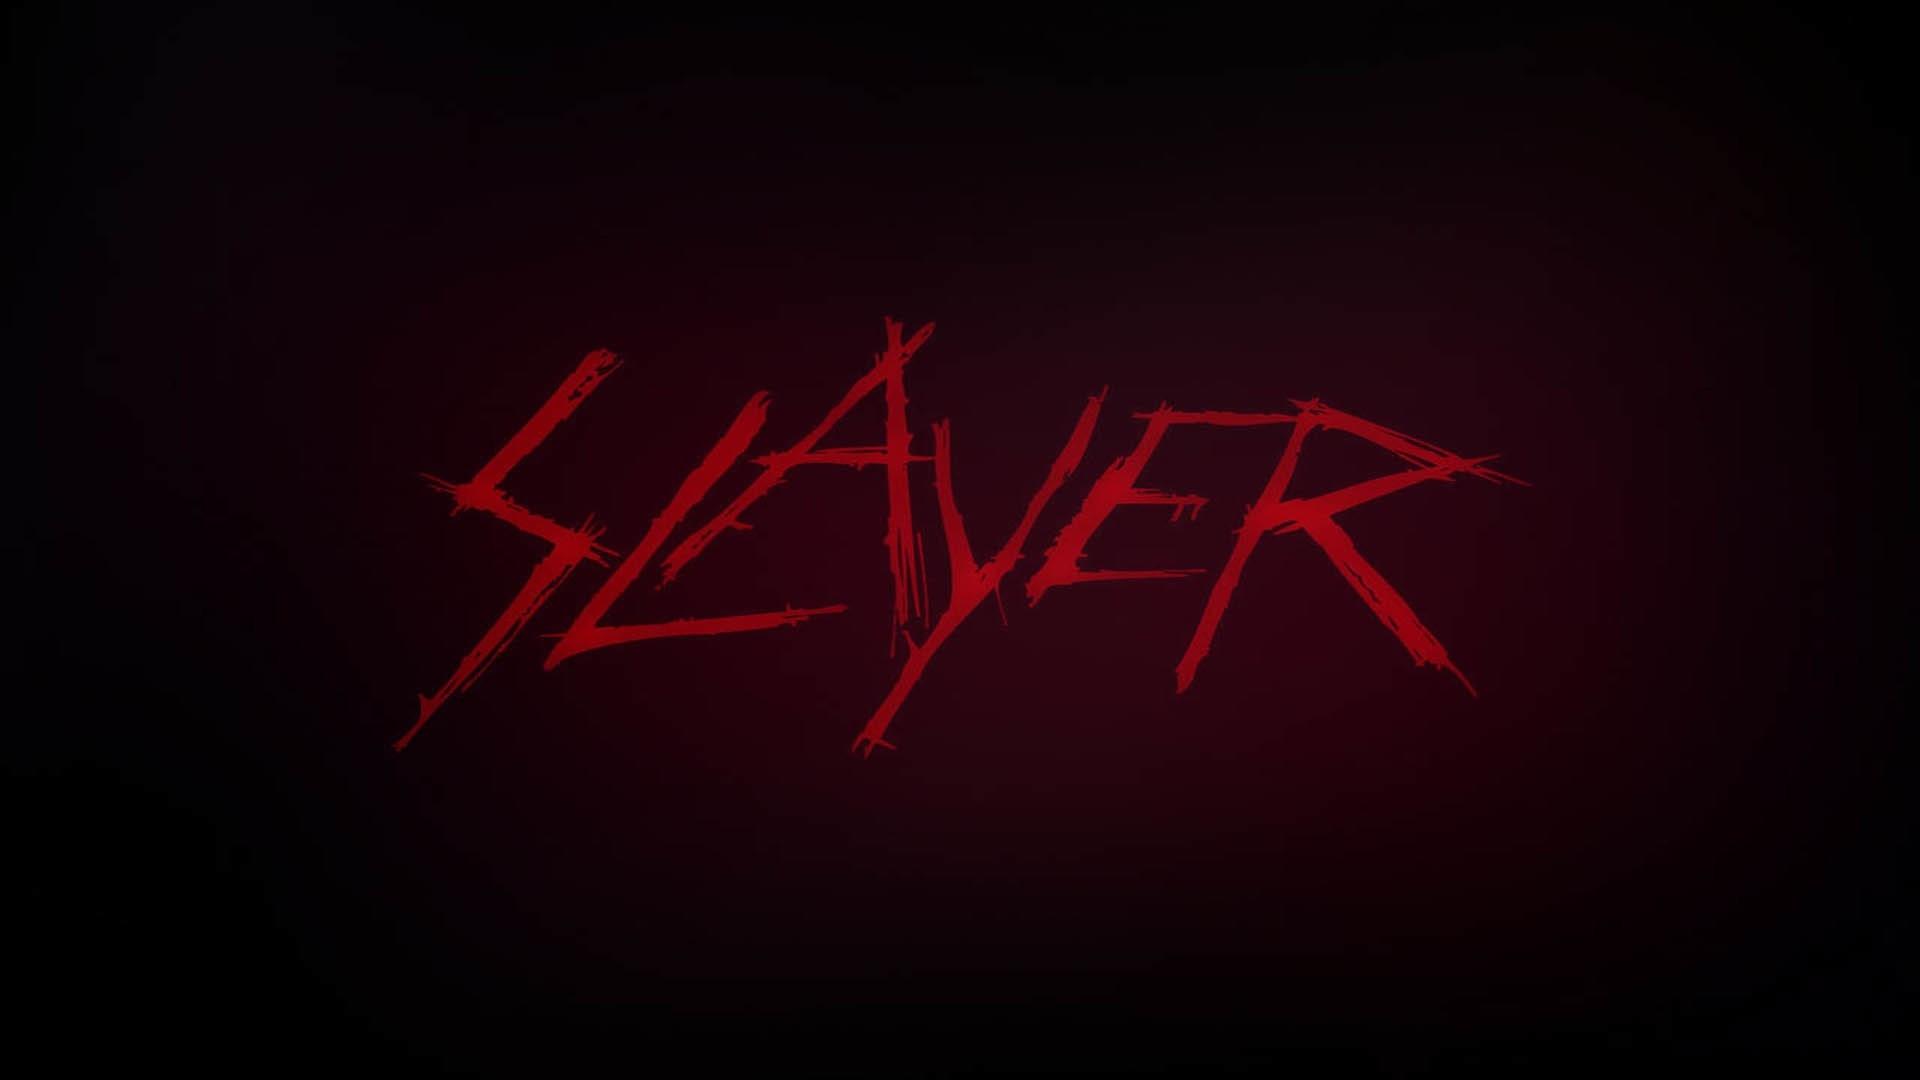 Slayer 1920x1080 wallpaper